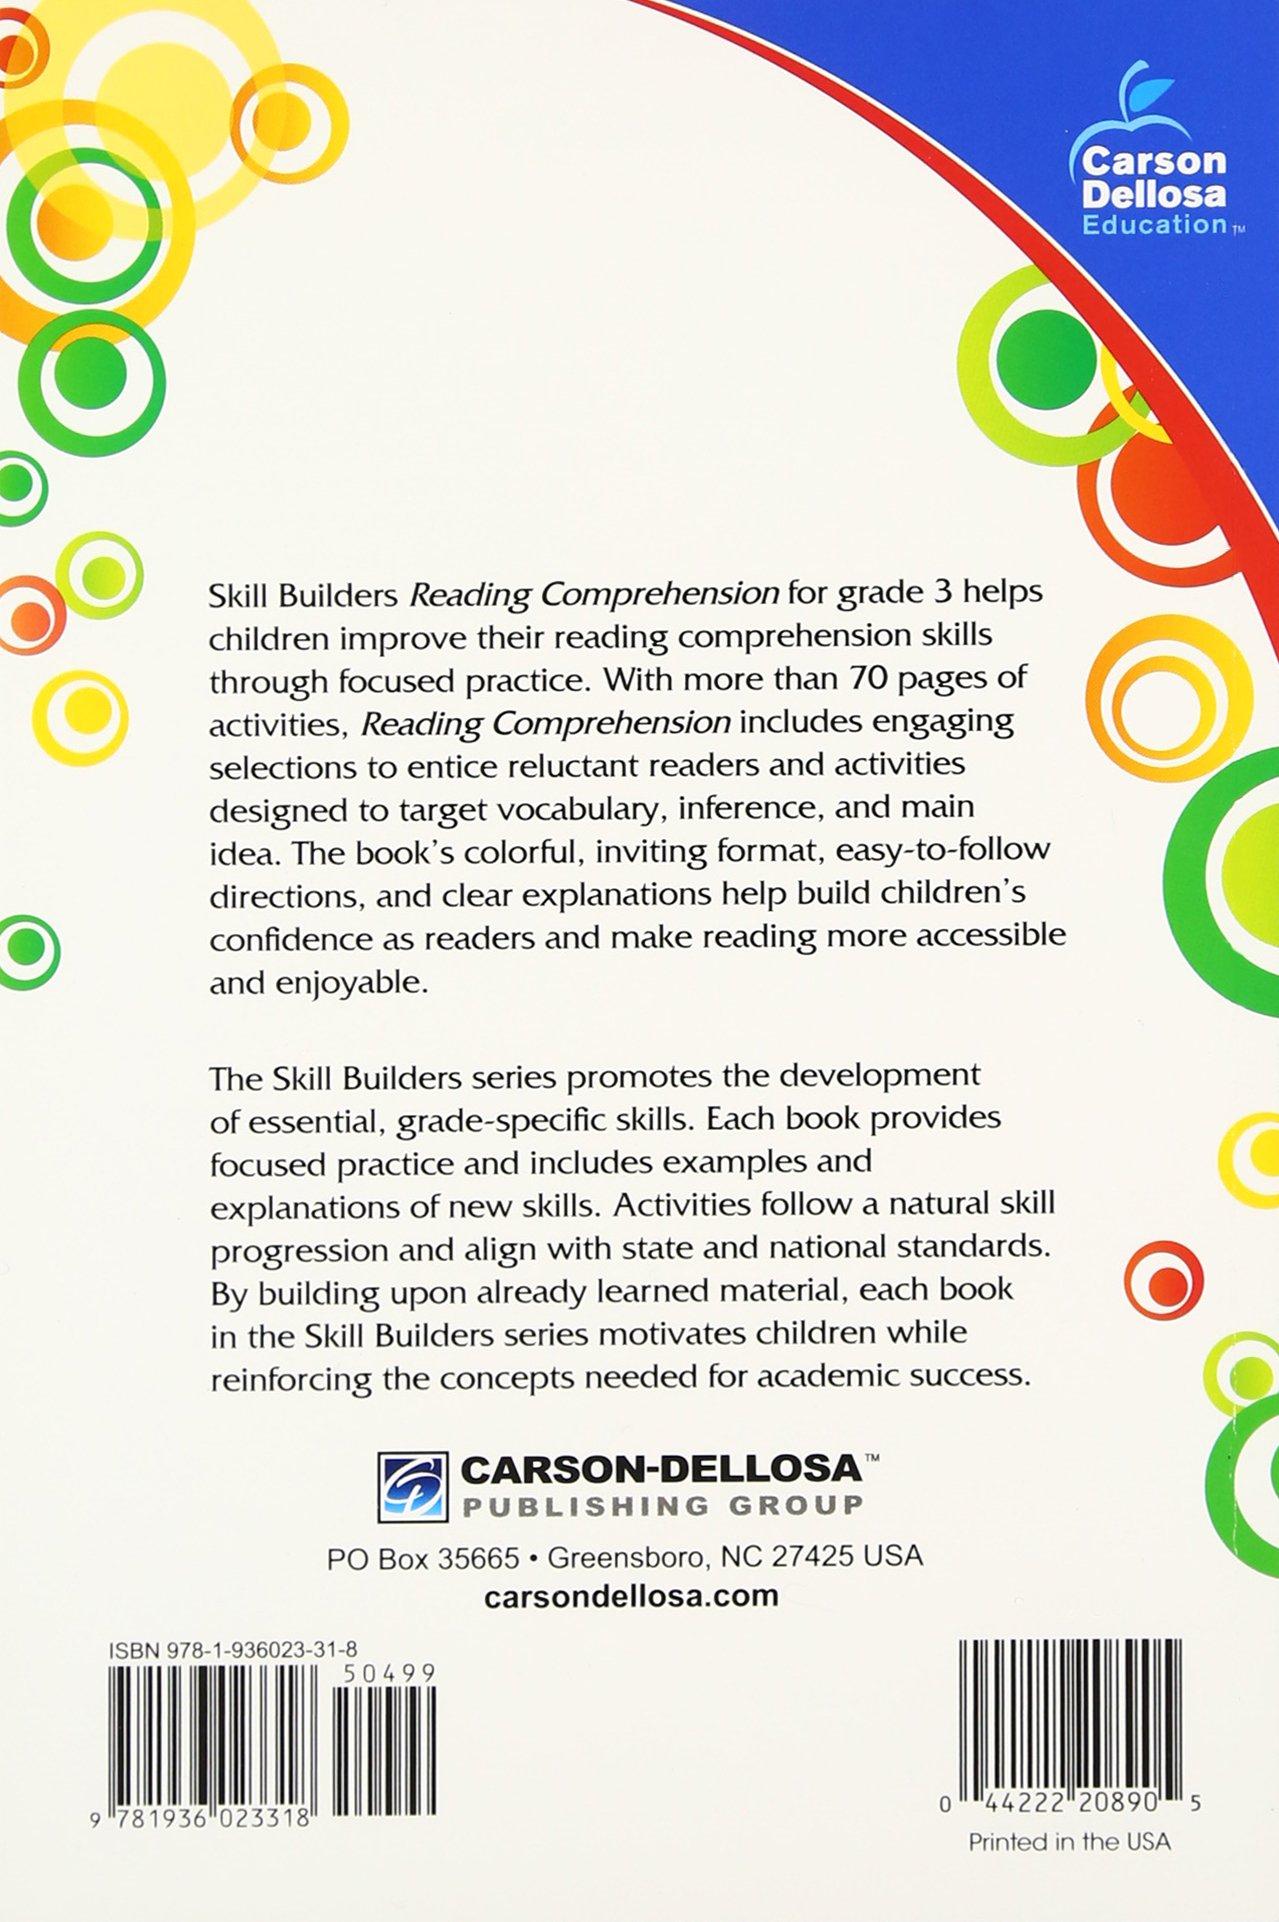 reading comprehension grade skill builders carson dellosa reading comprehension grade 3 skill builders carson dellosa publishing 0044222208905 com books